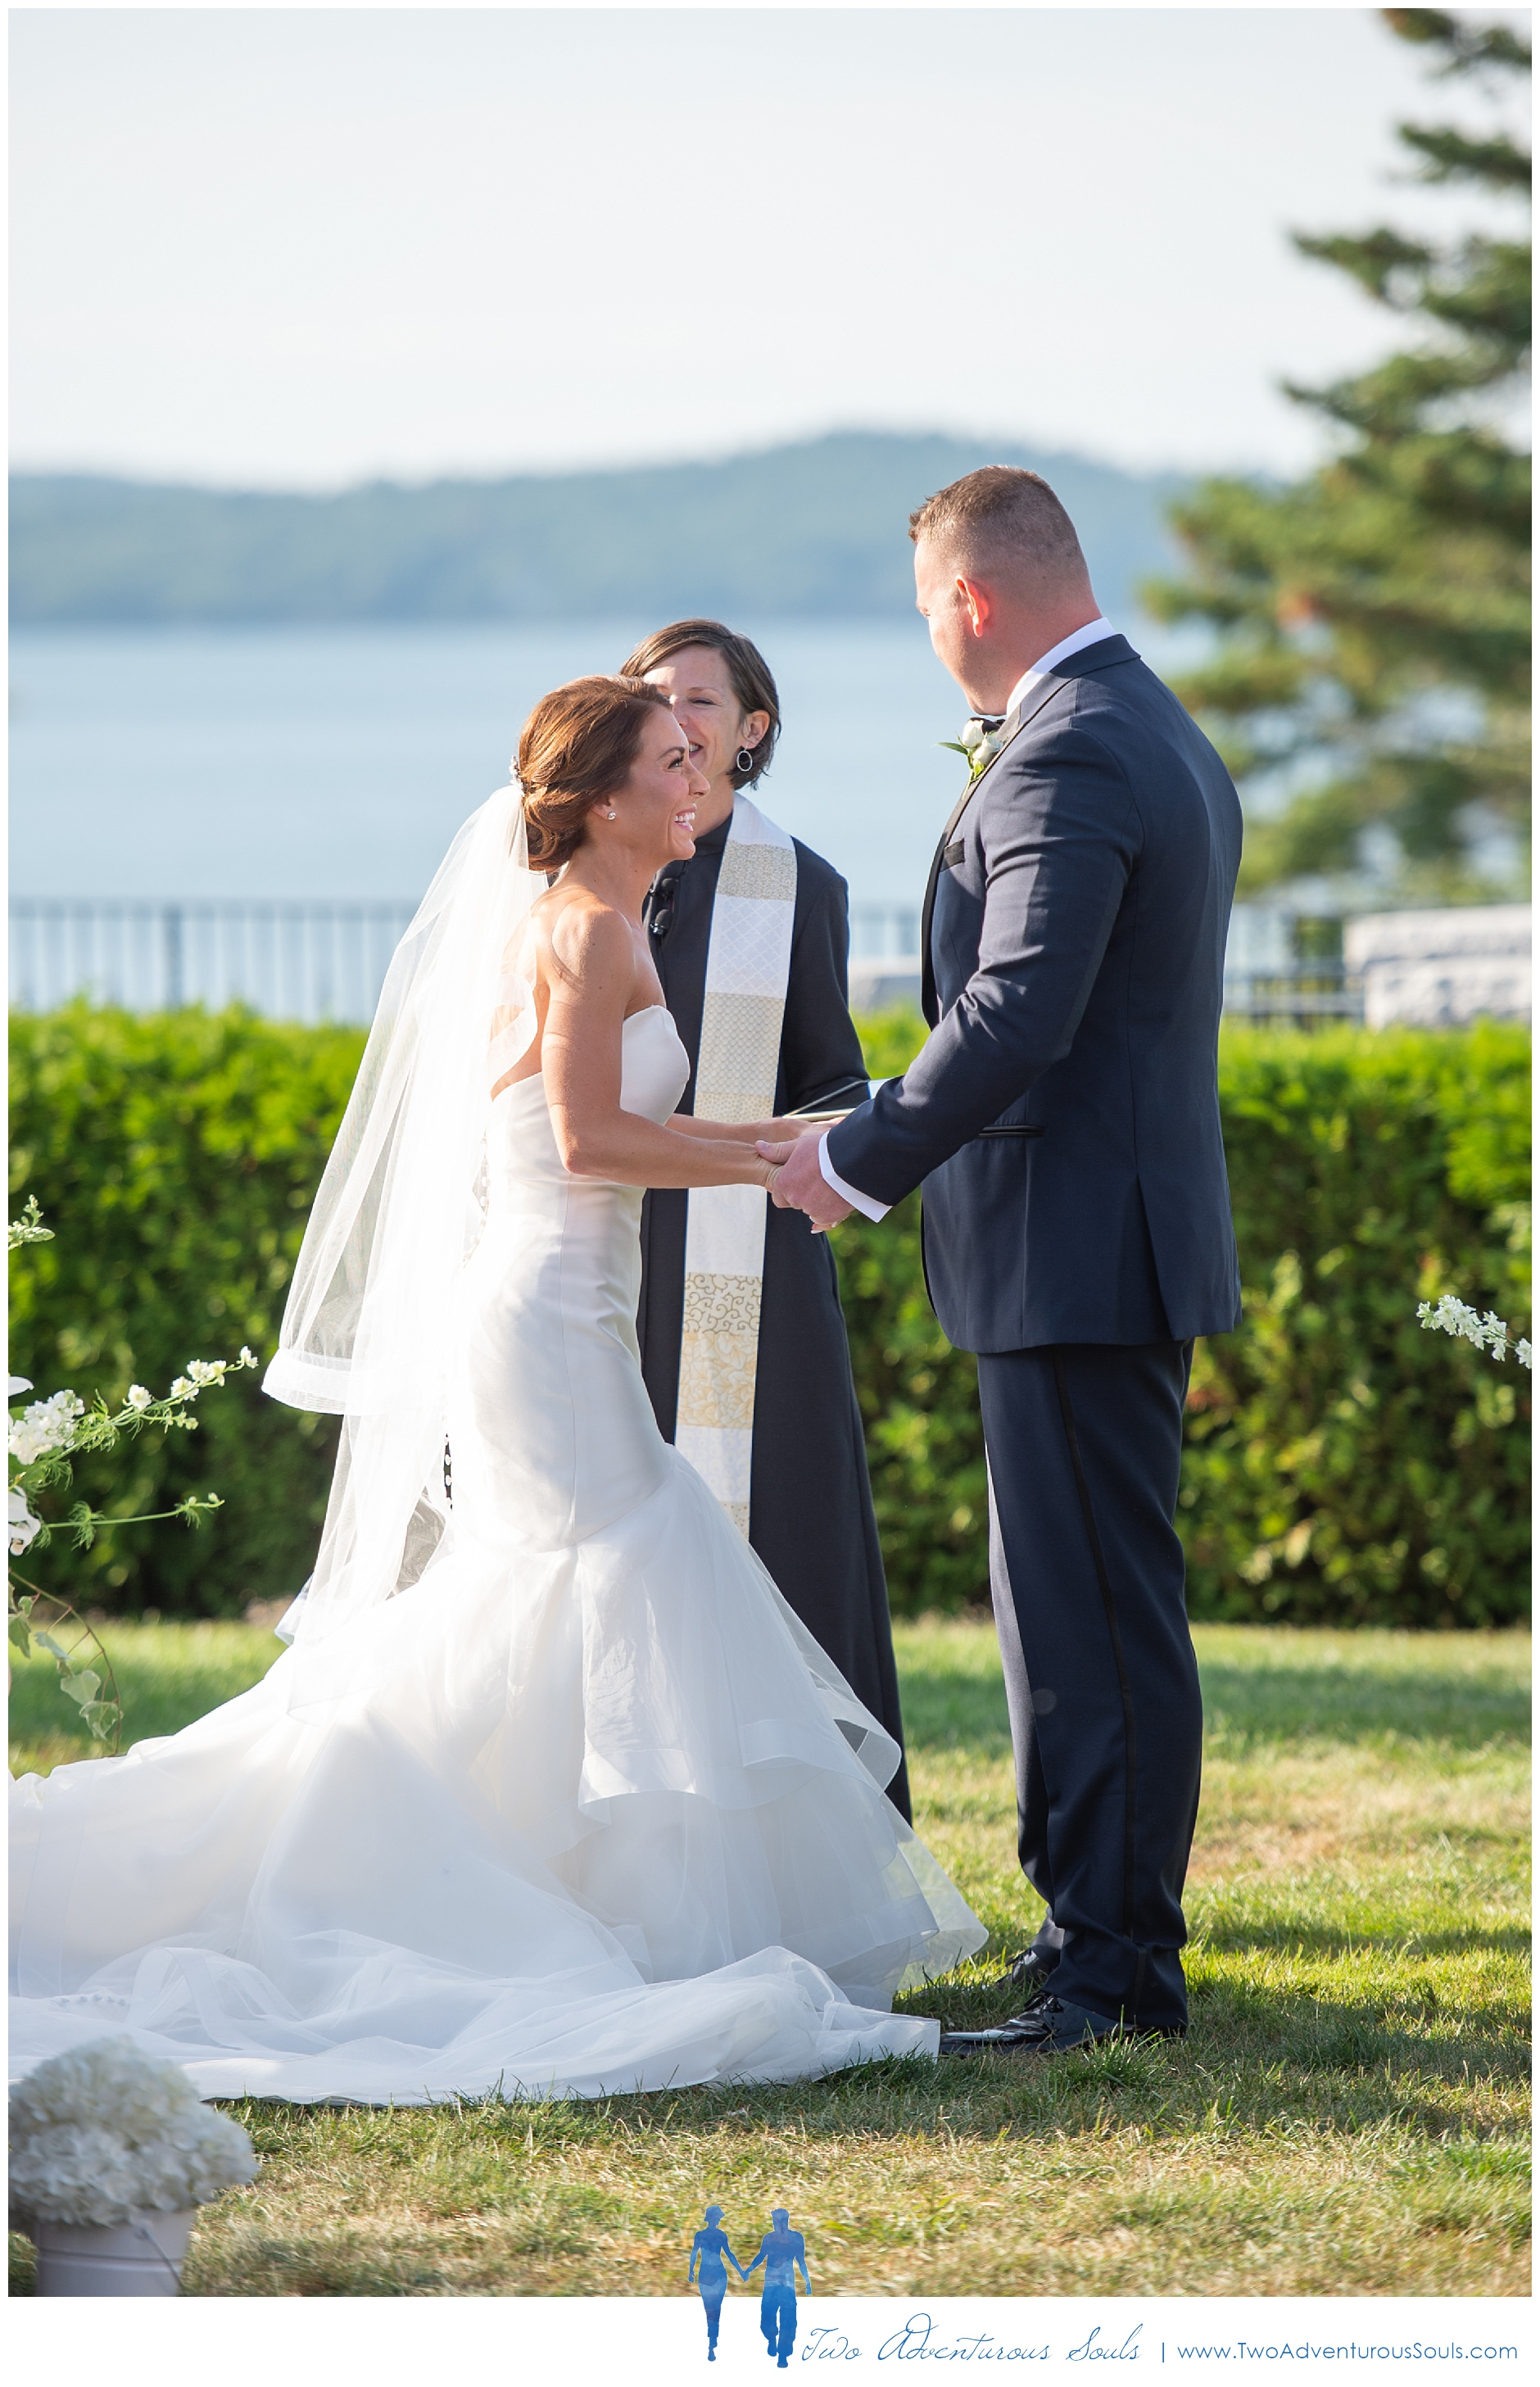 090218+-+Megan+&+Jason+-+sneaks-86_Bar+Harbor+Wedding+Photographers,+Destination+Wedding+Photographers.jpg